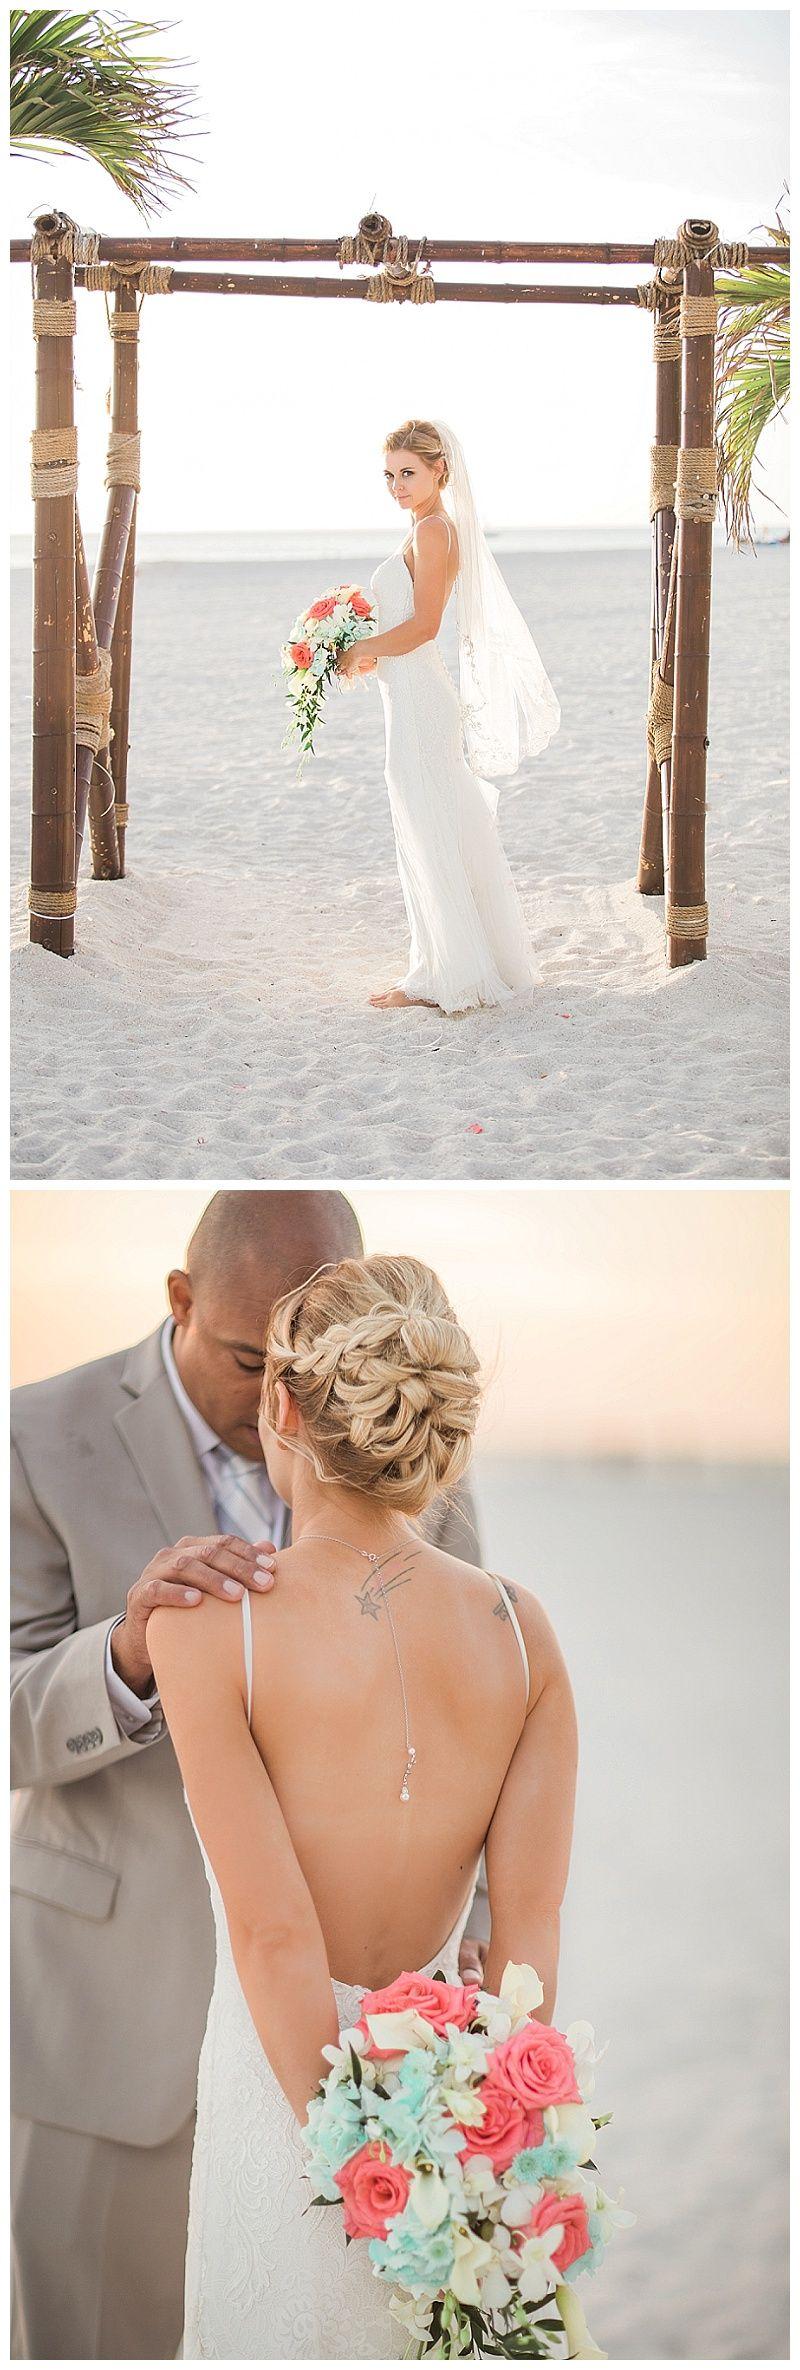 Wedding Ideas, First Look Photos, Wedding Poses, Weddding